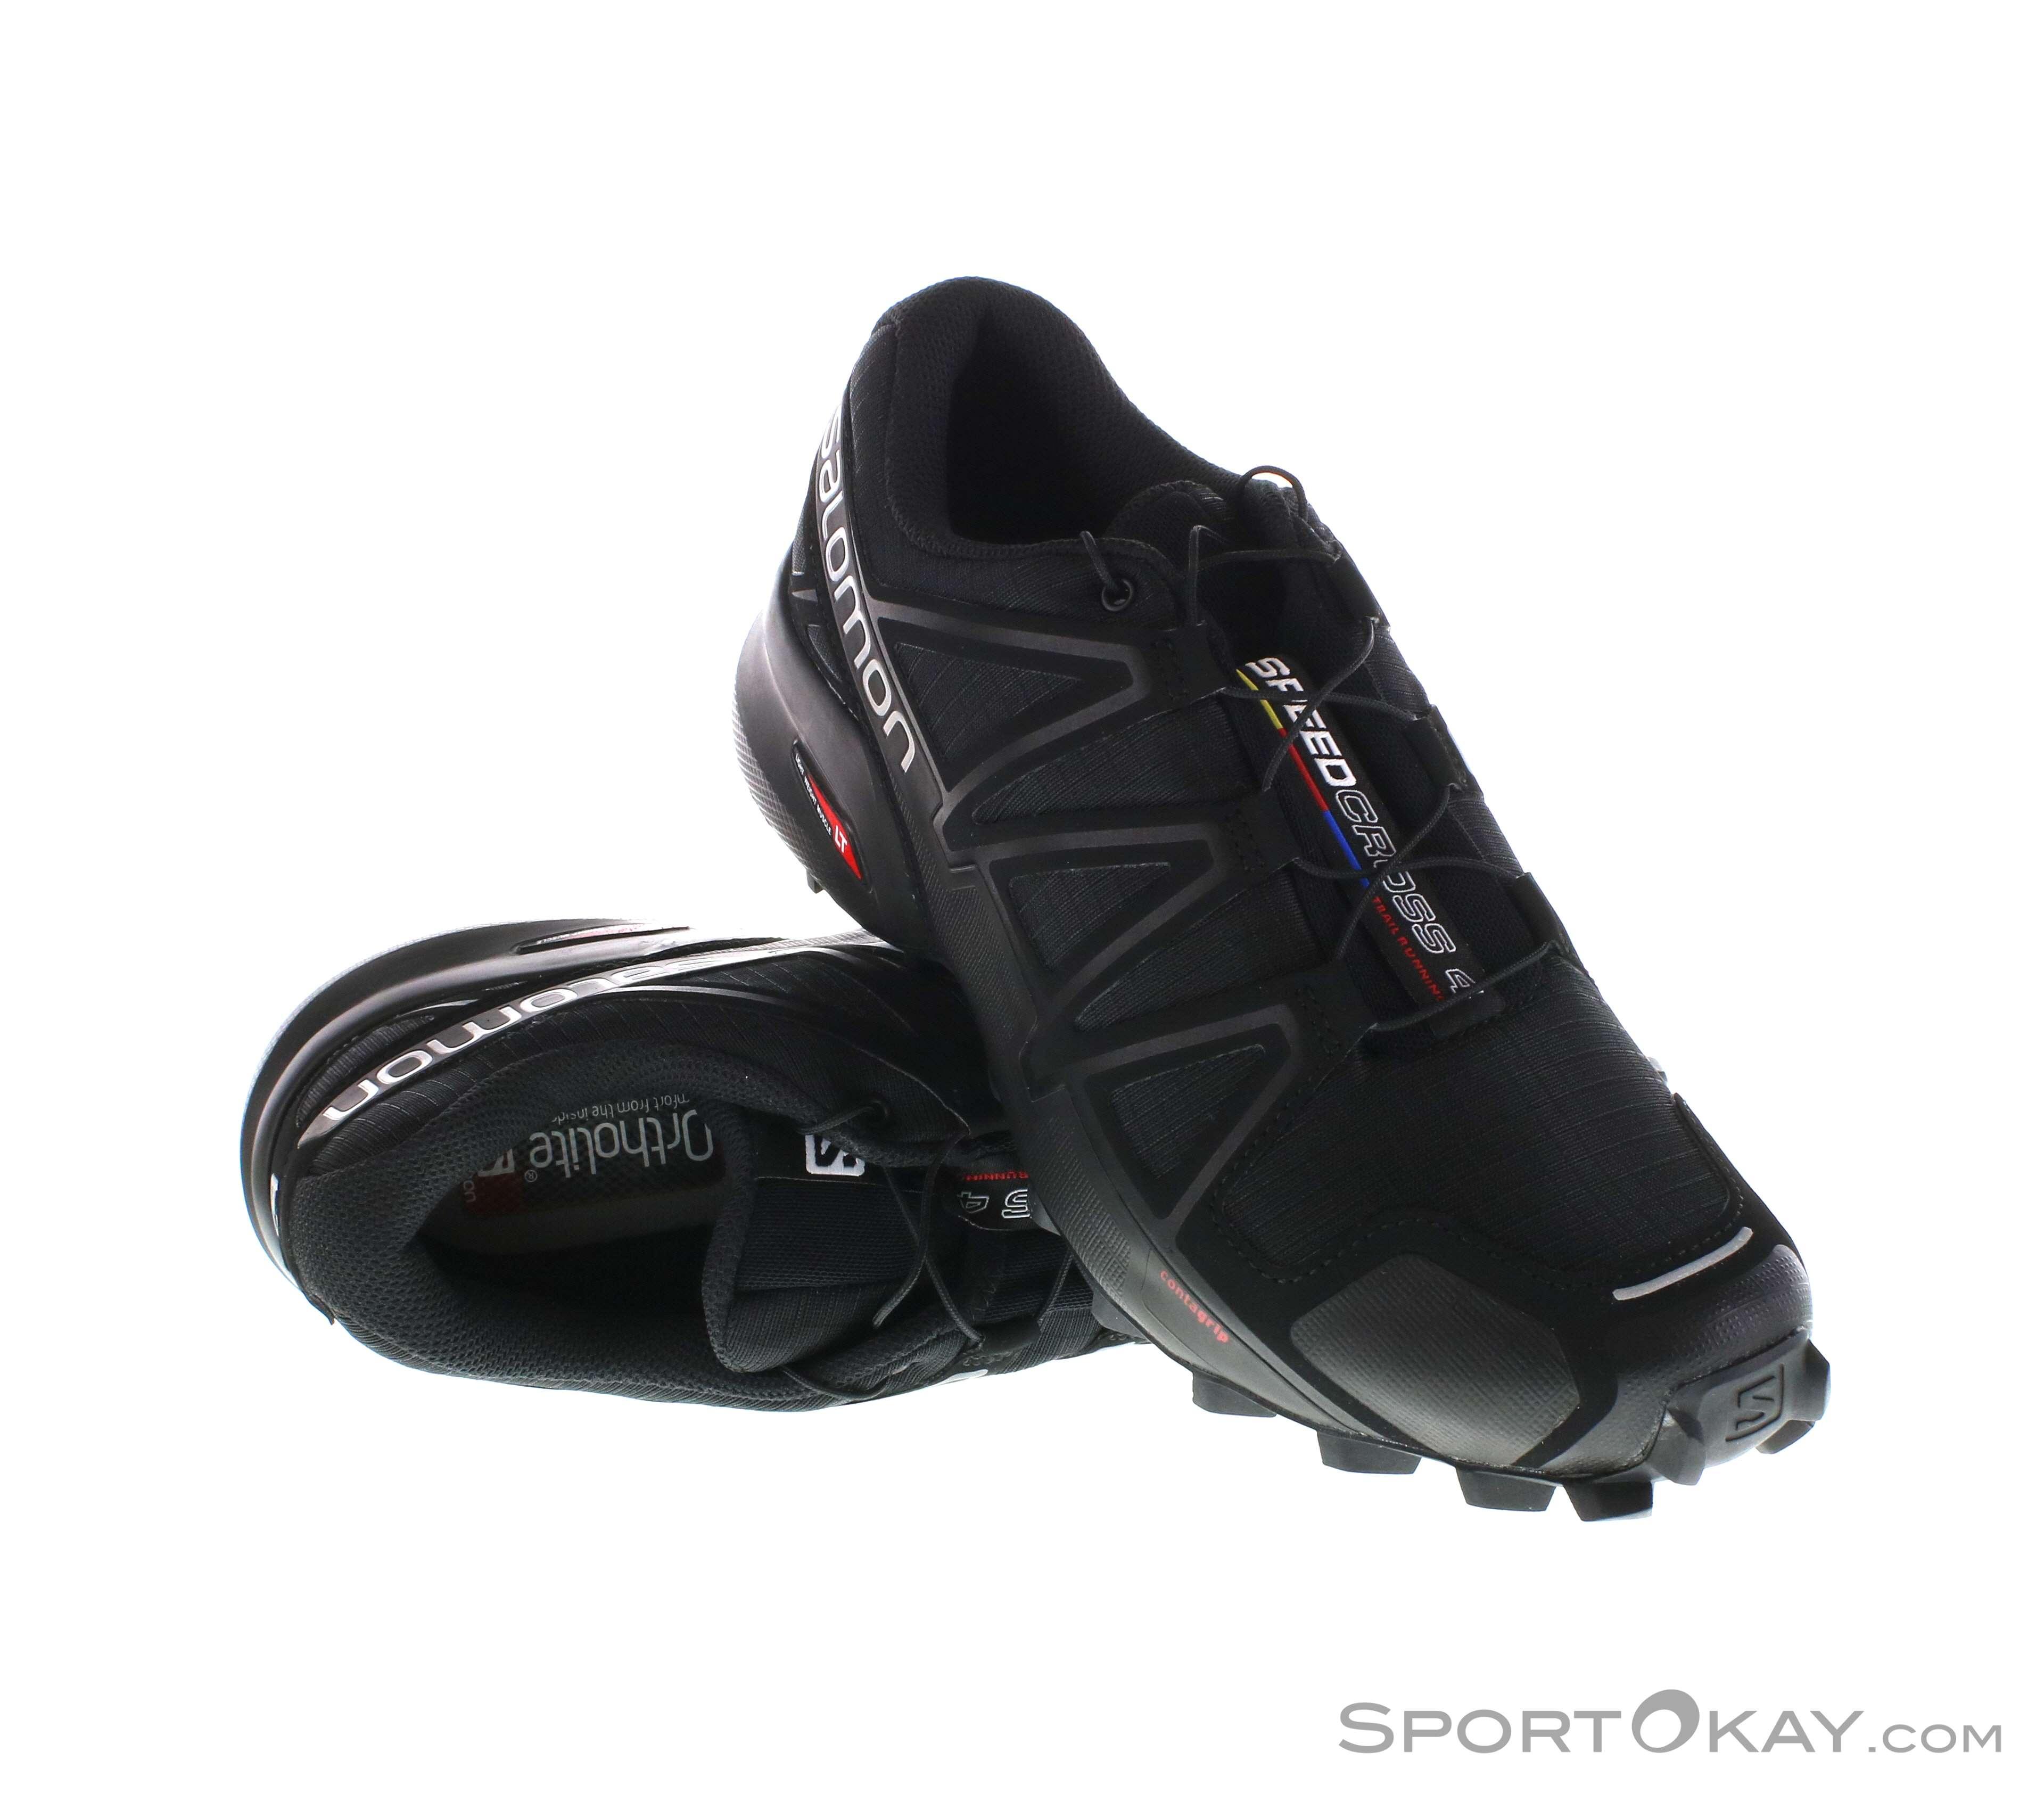 Salomon Speedcross 4 Damen Traillaufschuhe-Schwarz-6